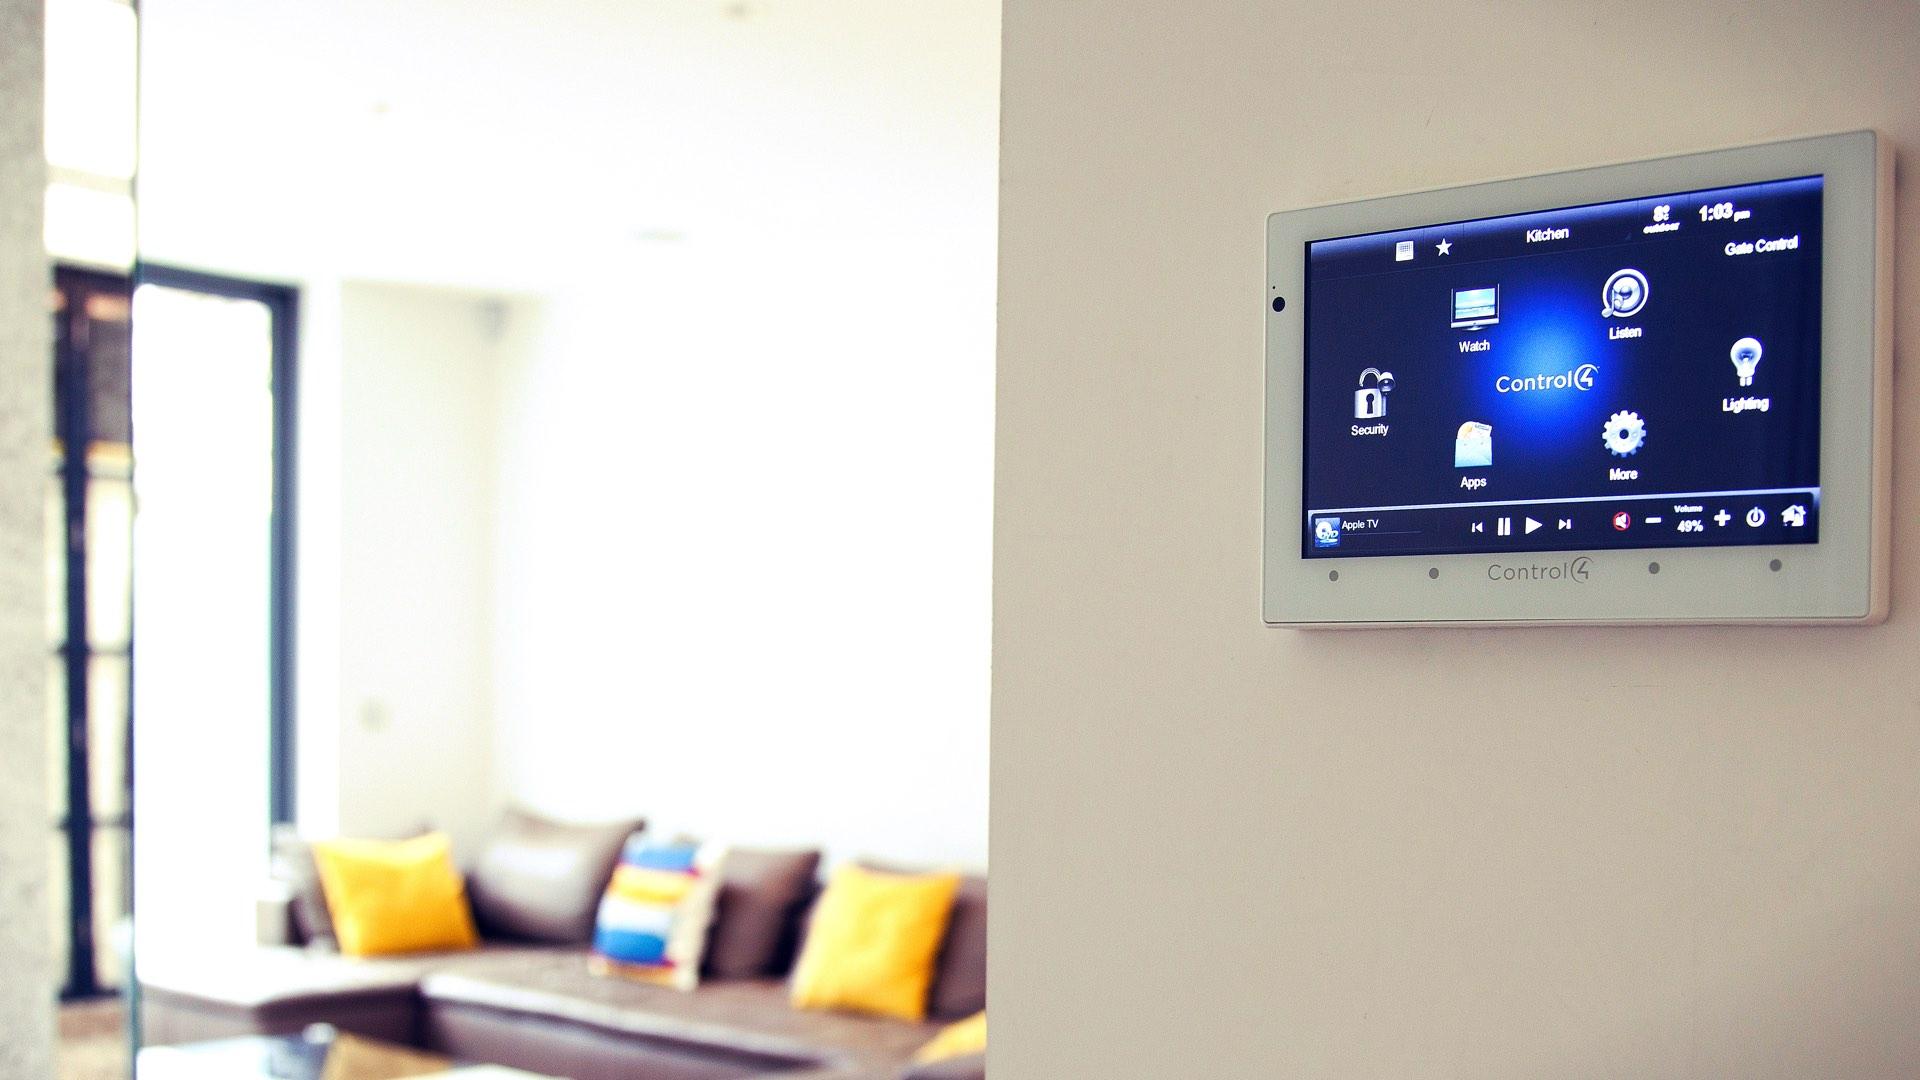 hero-smart-home-in-wall-touchscreen